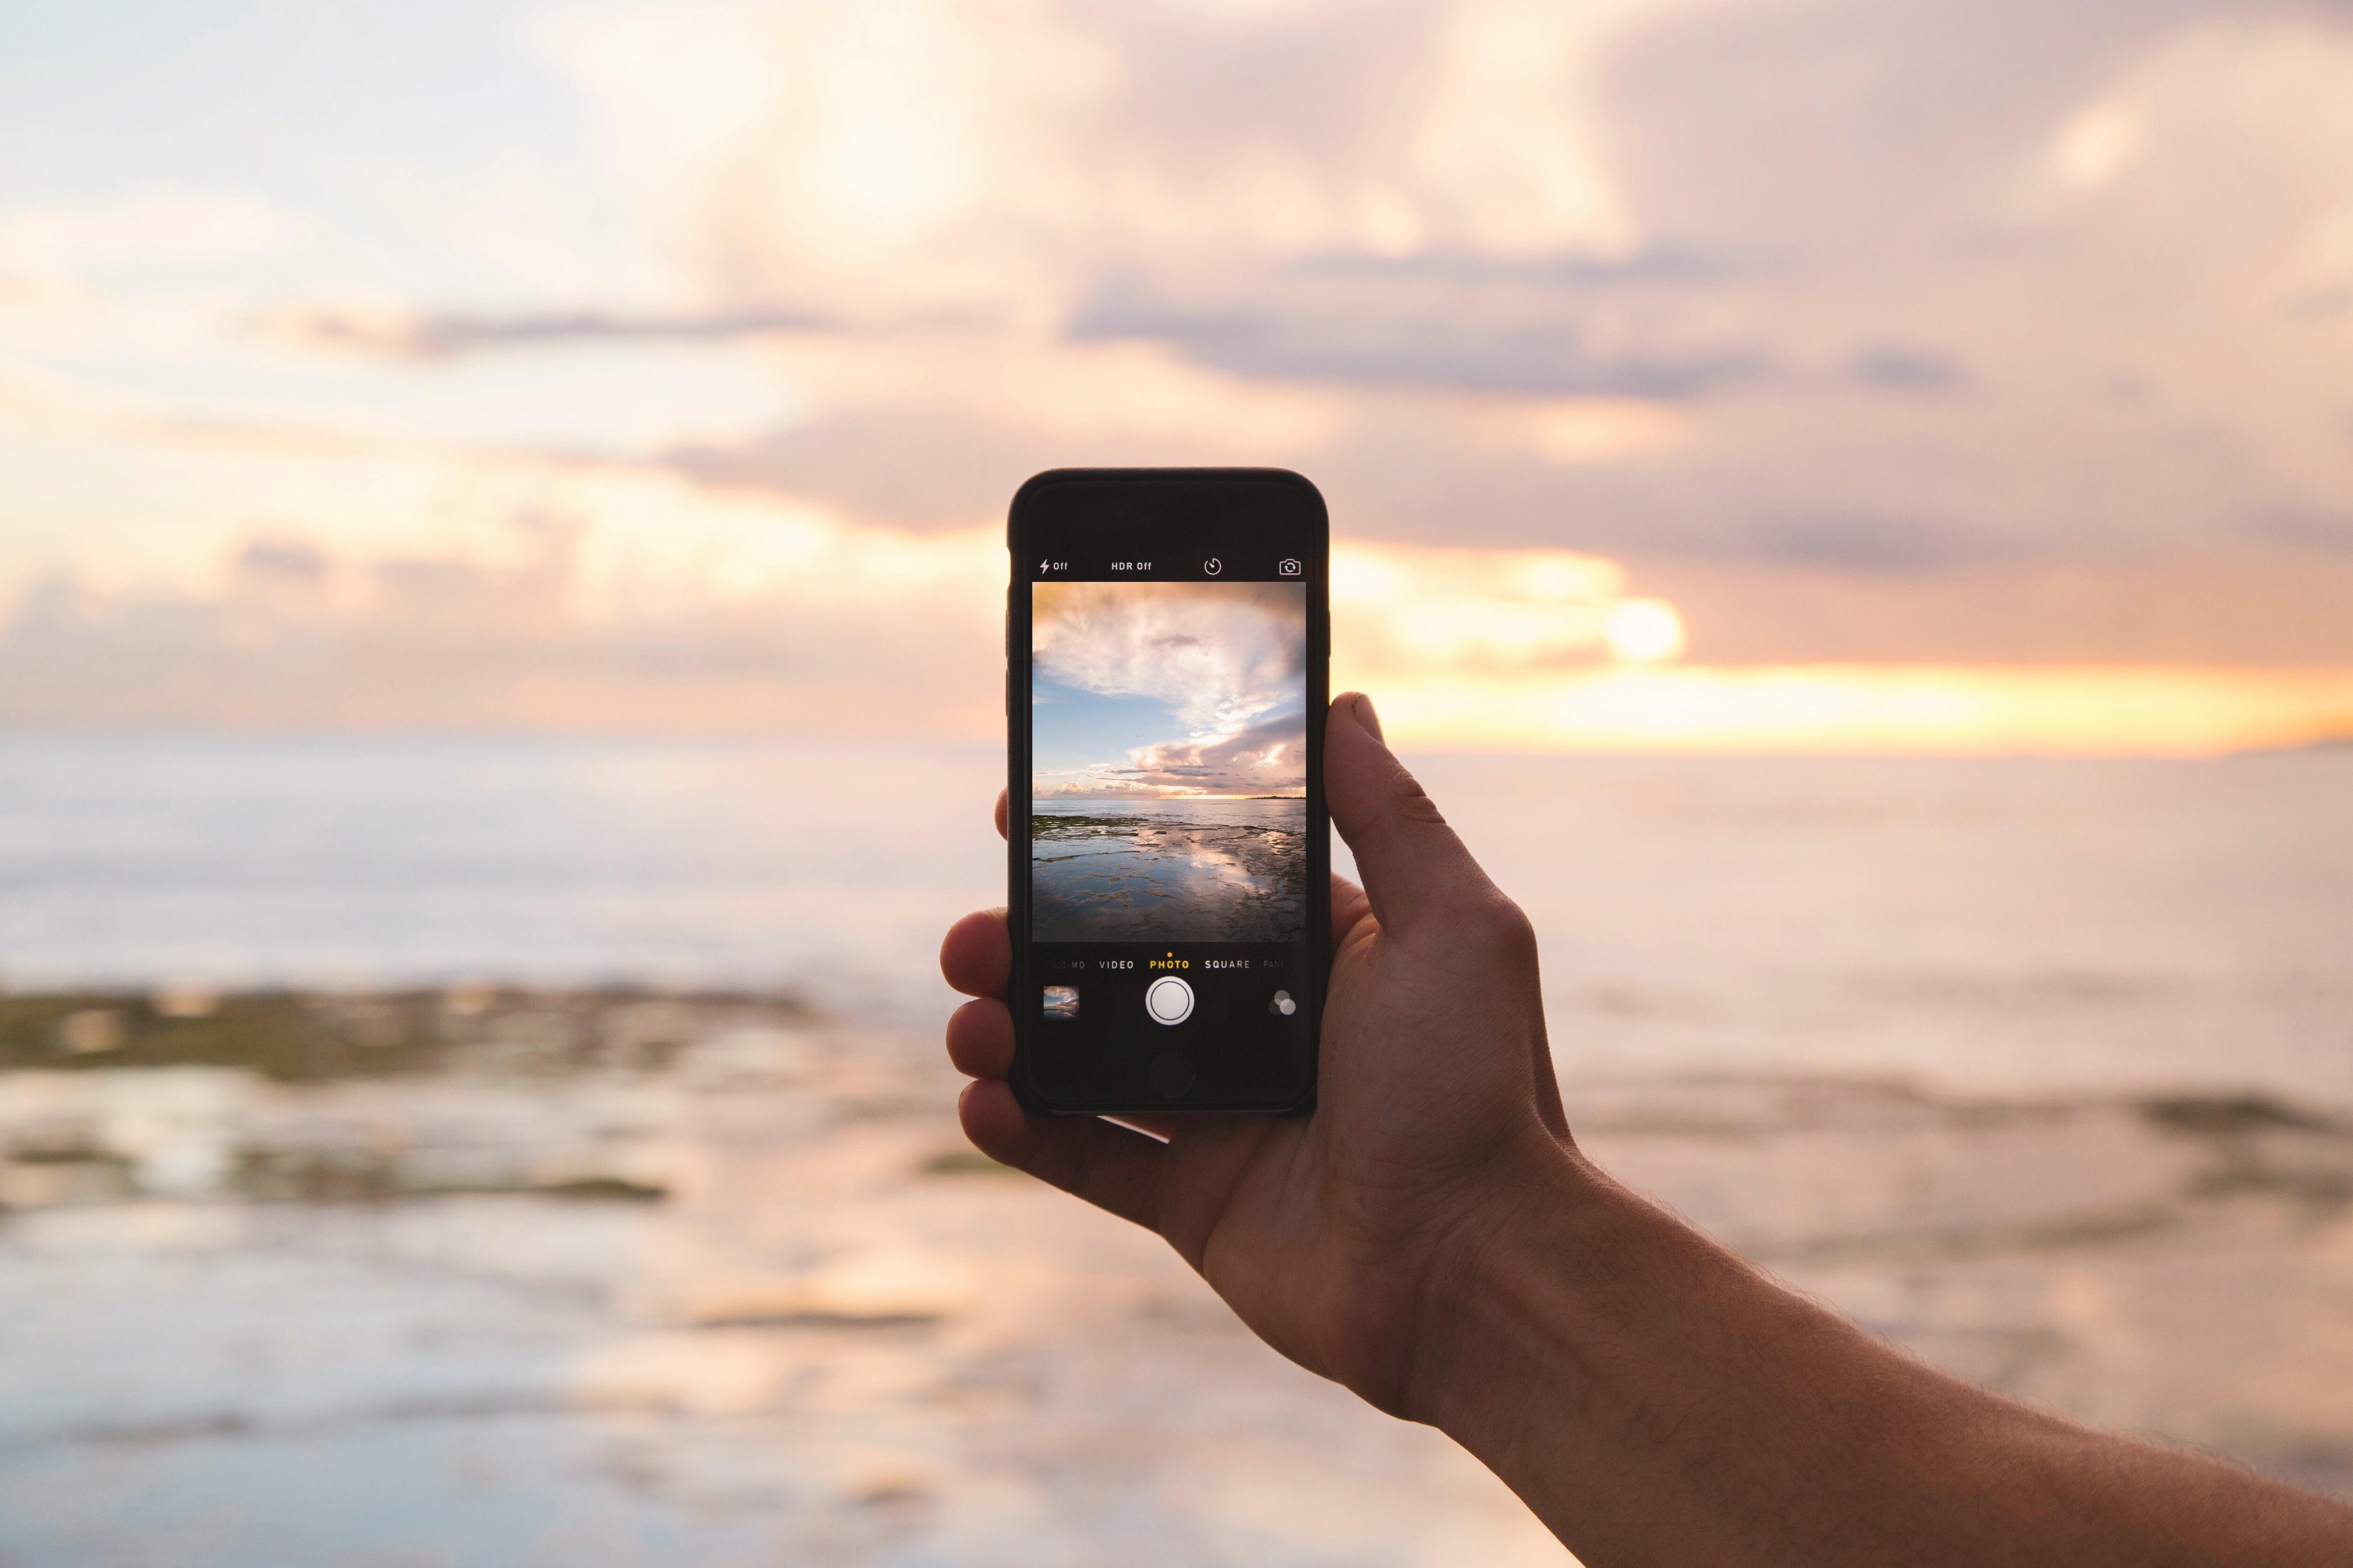 Life-of-Pix-free-stock-photos-ocean-arm-iphone-jordanmcqueen